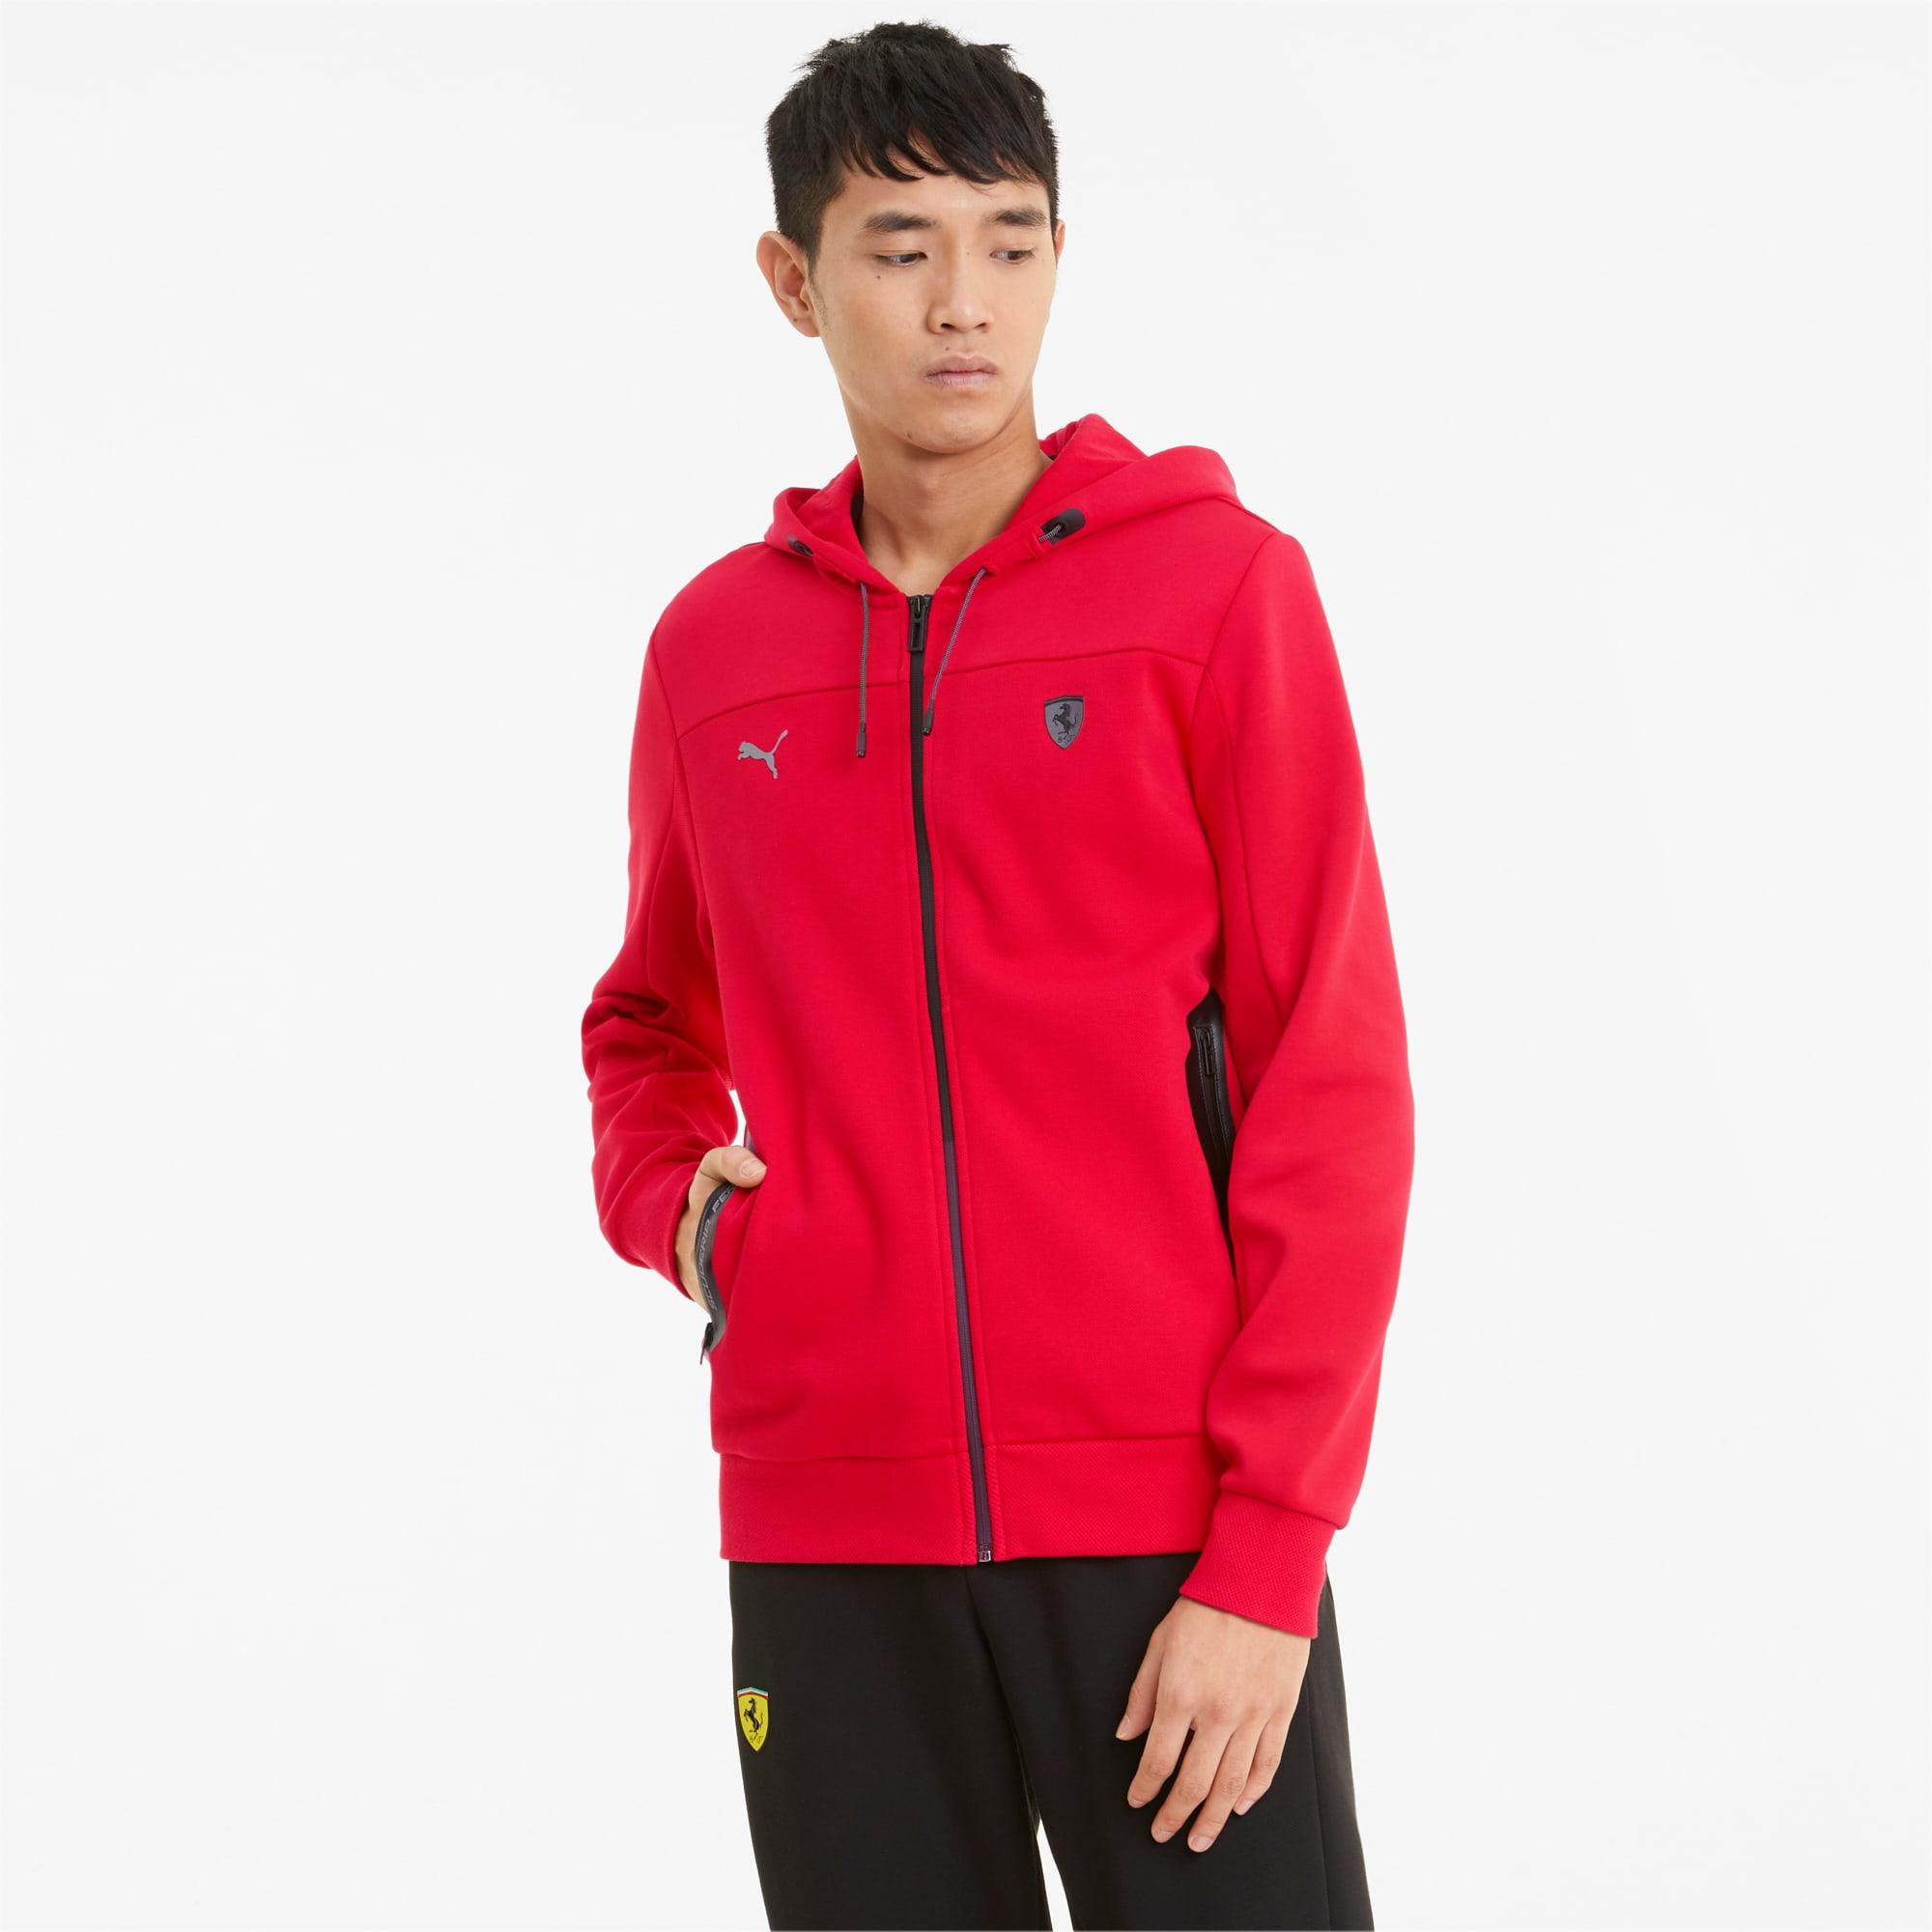 Scuderia Ferrari Style Hooded Men S Sweat Jacket Rosso Corsa Puma Mens Styles Puma Germany